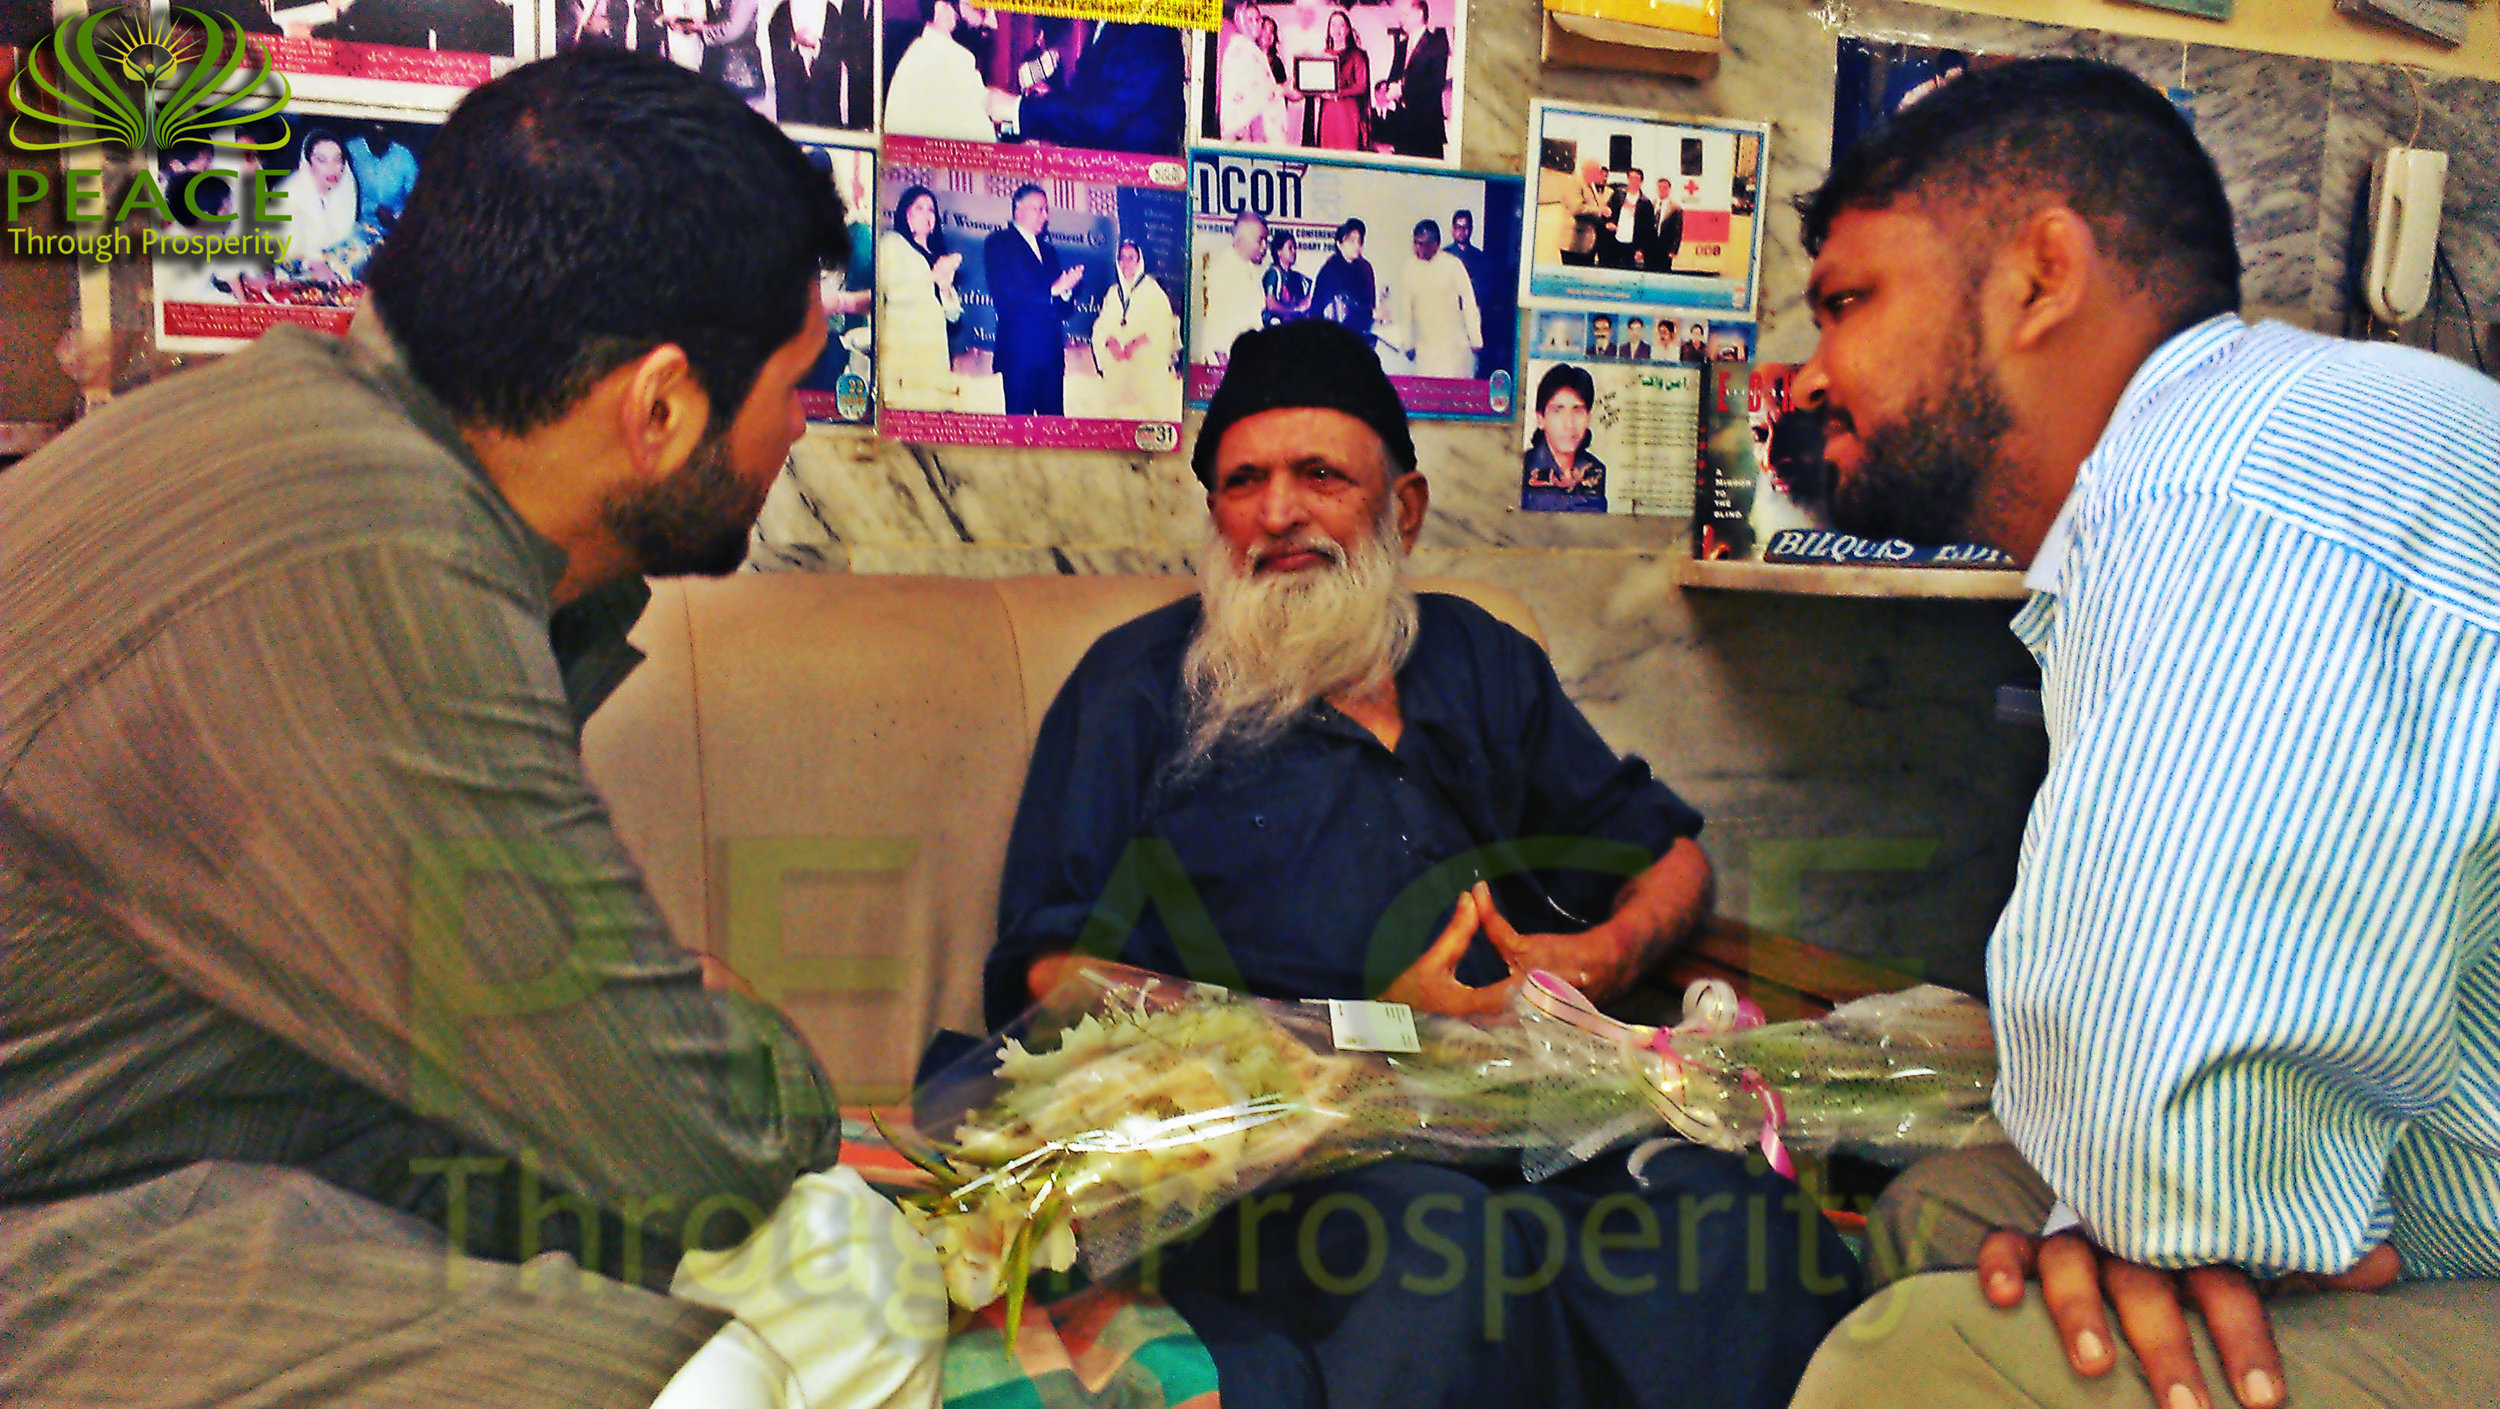 Peace Through Prosperity 's team benefiting from the icon of Pakistan - Abdul Sattar Edhi